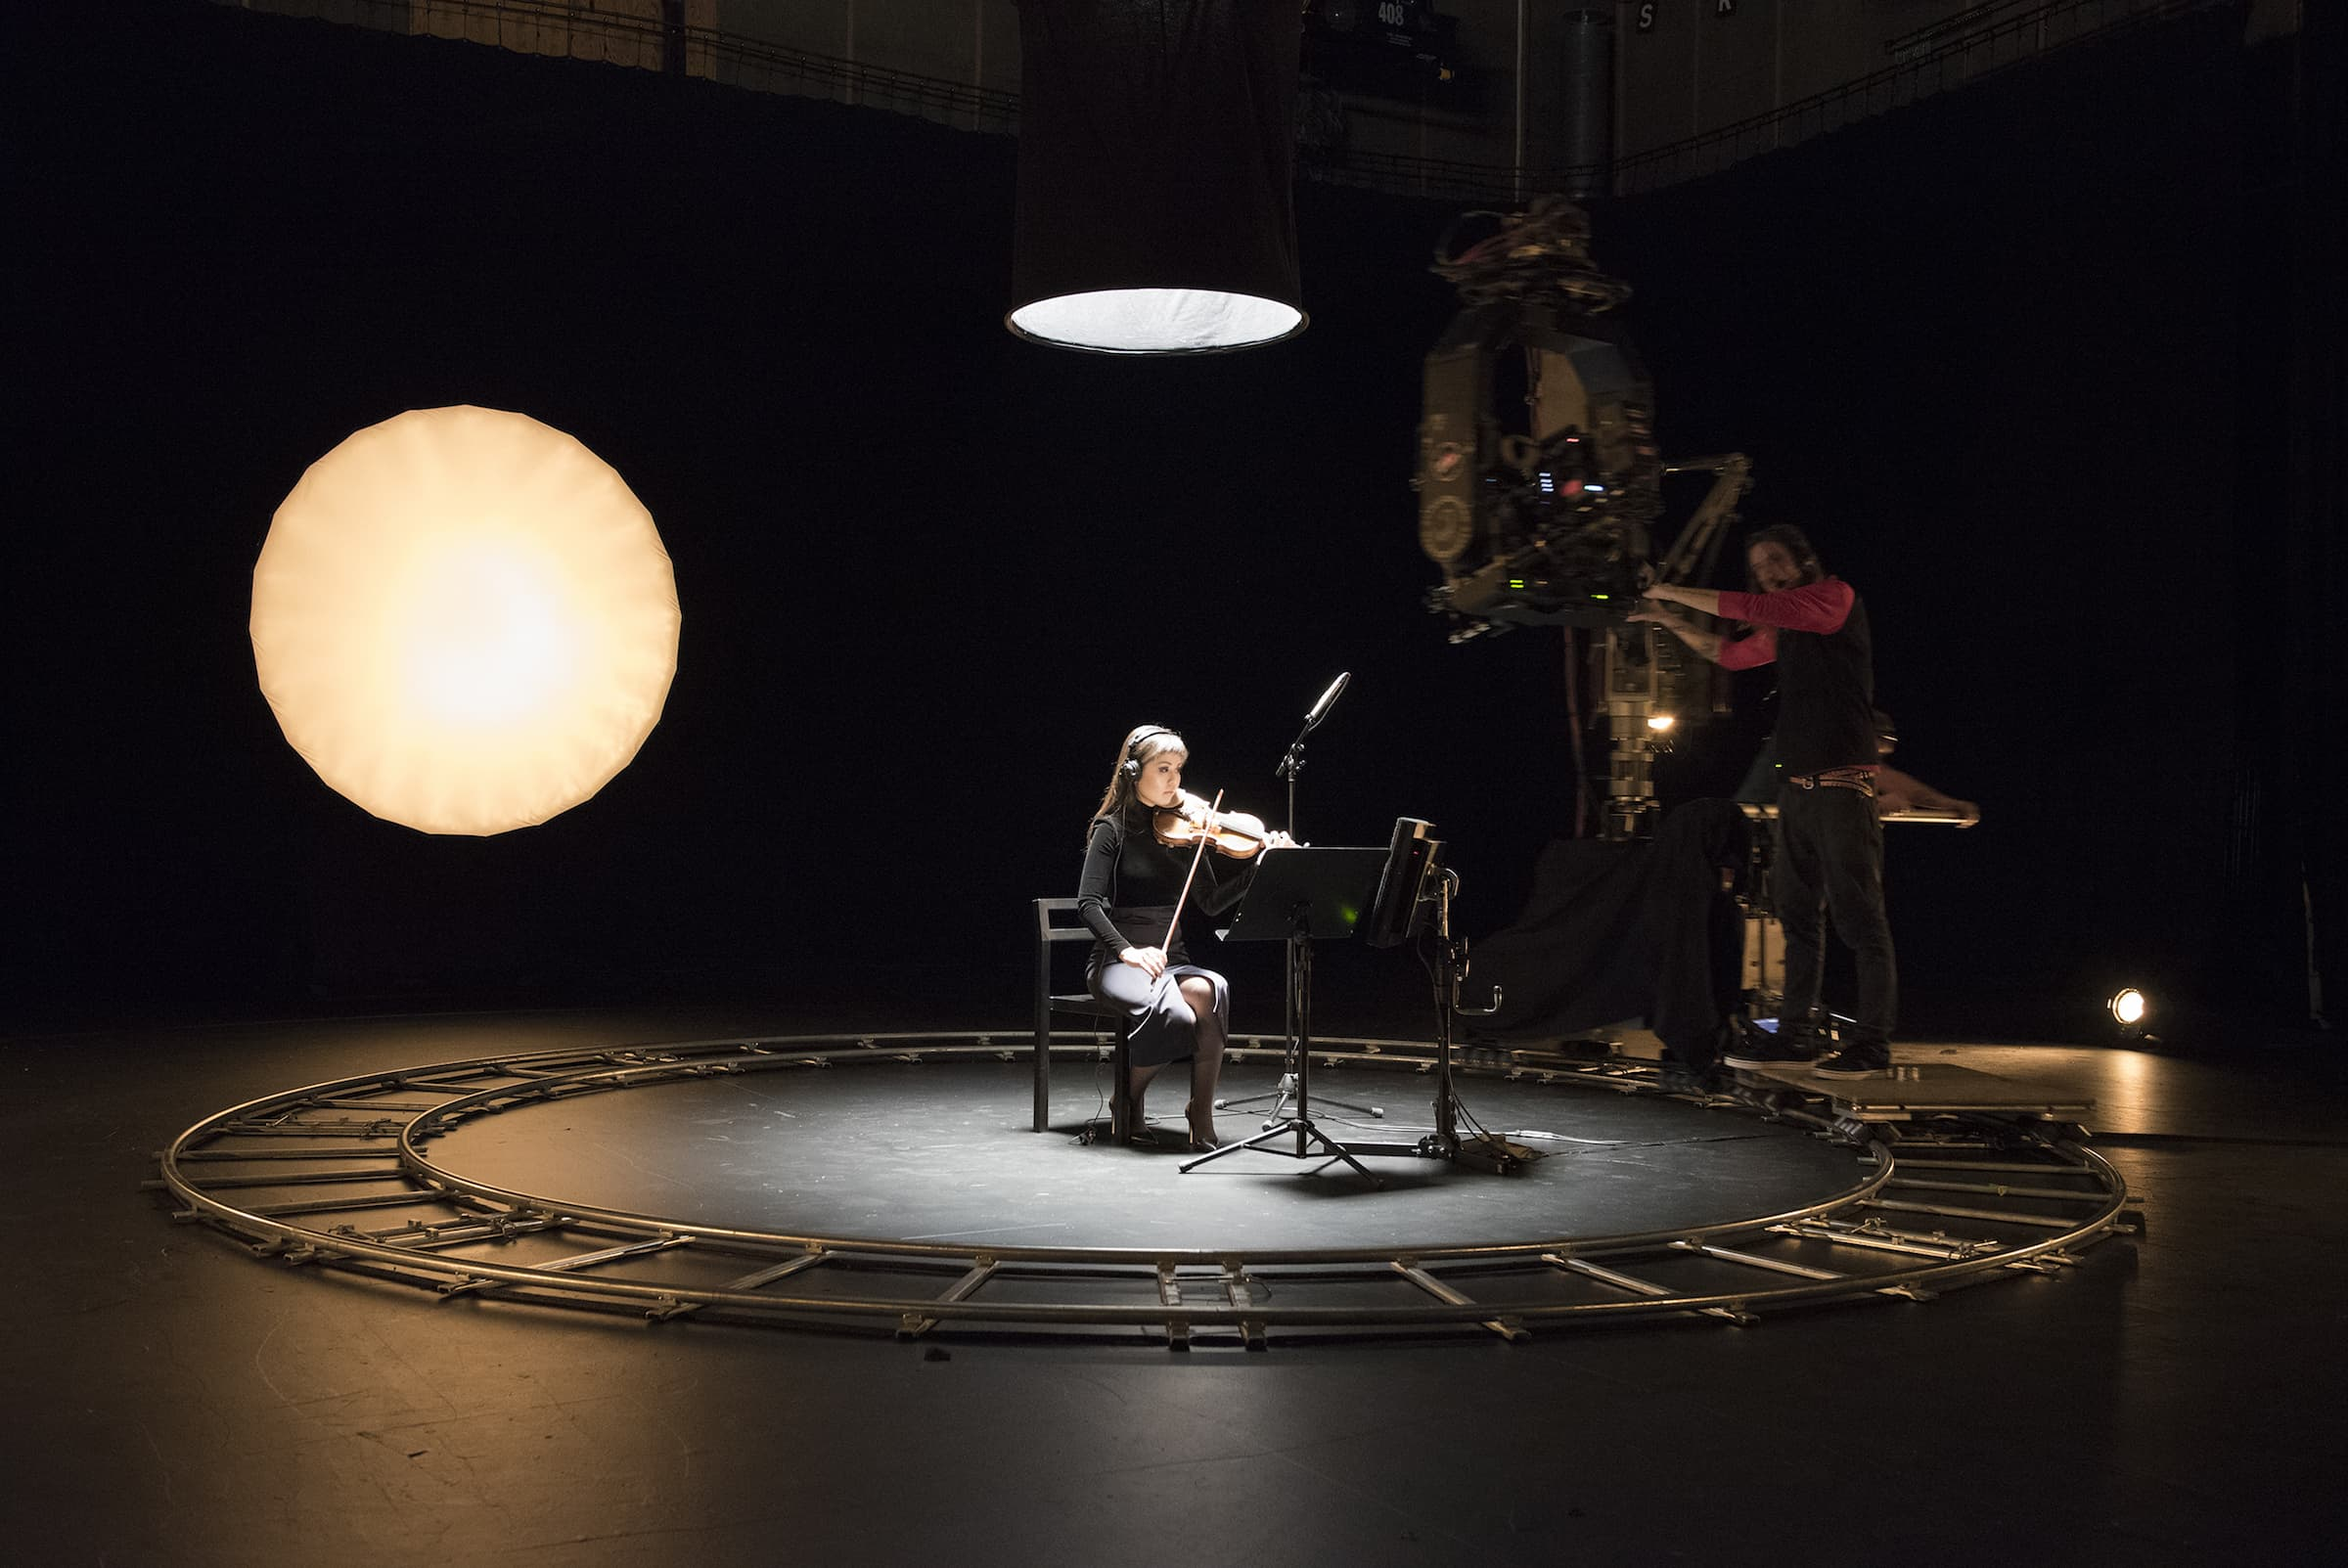 Bonniers Konsthall ställer ut Susan Philipsz Lost in Space